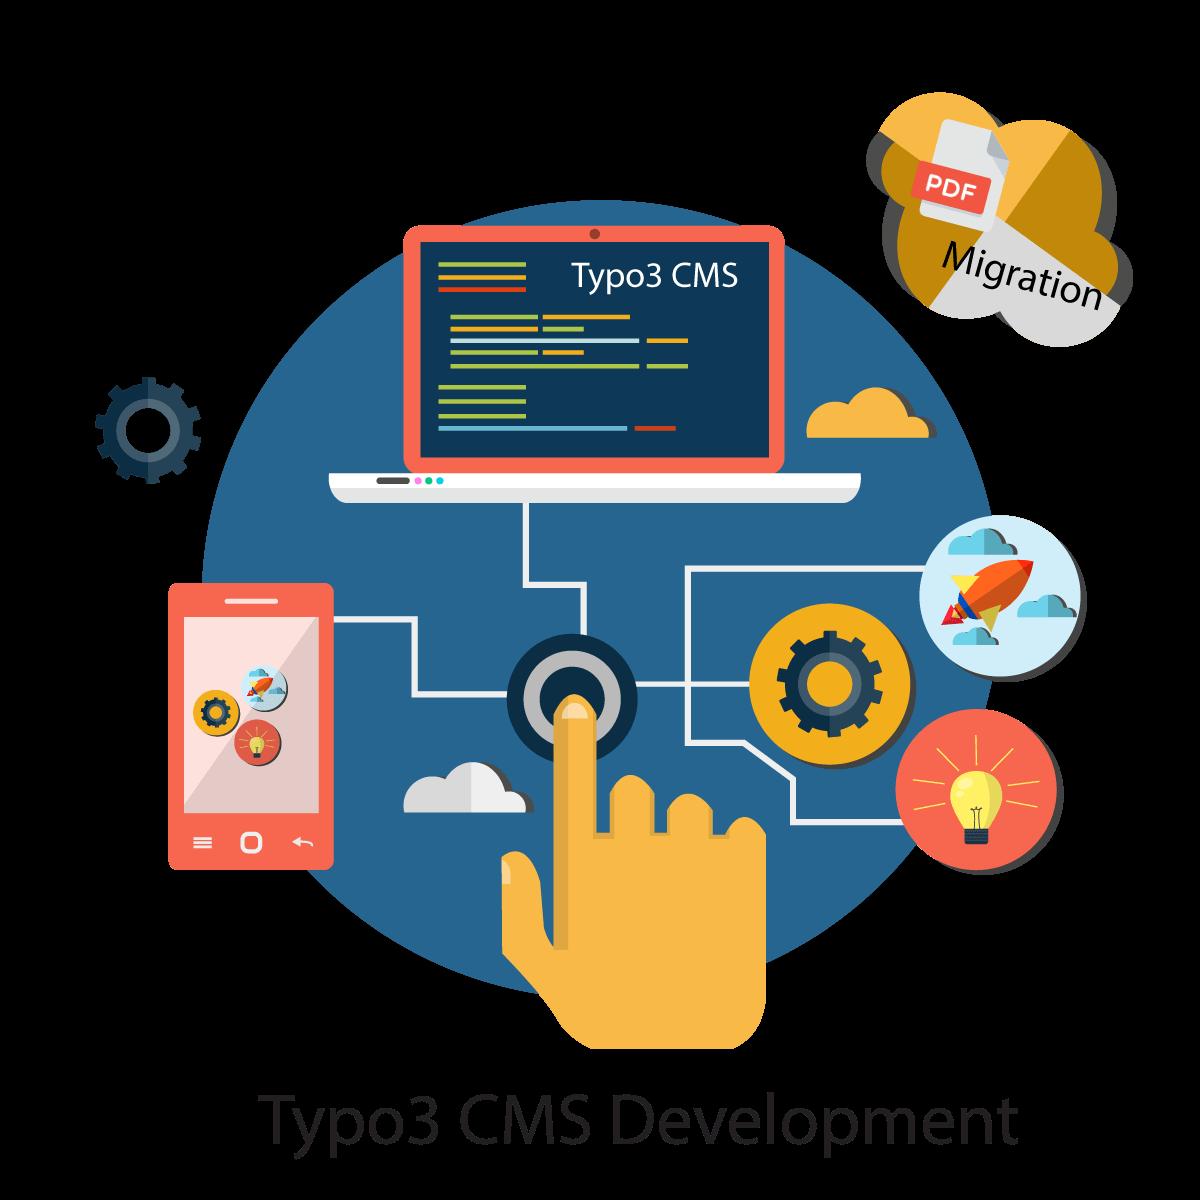 Typo3 cms development company